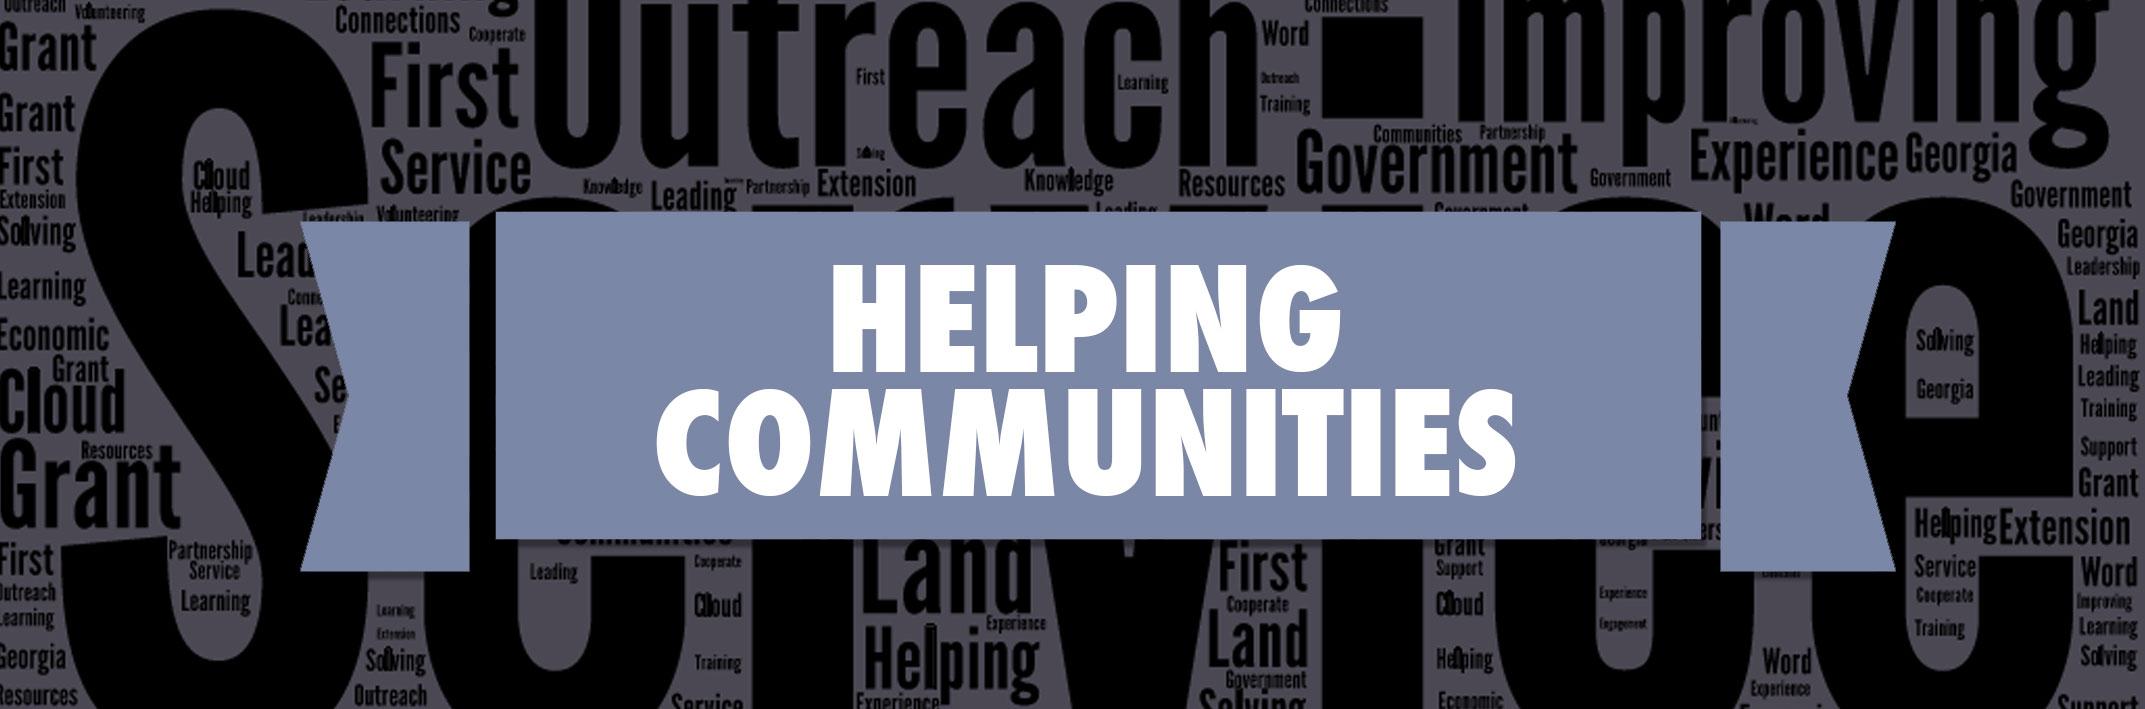 Helping Communities